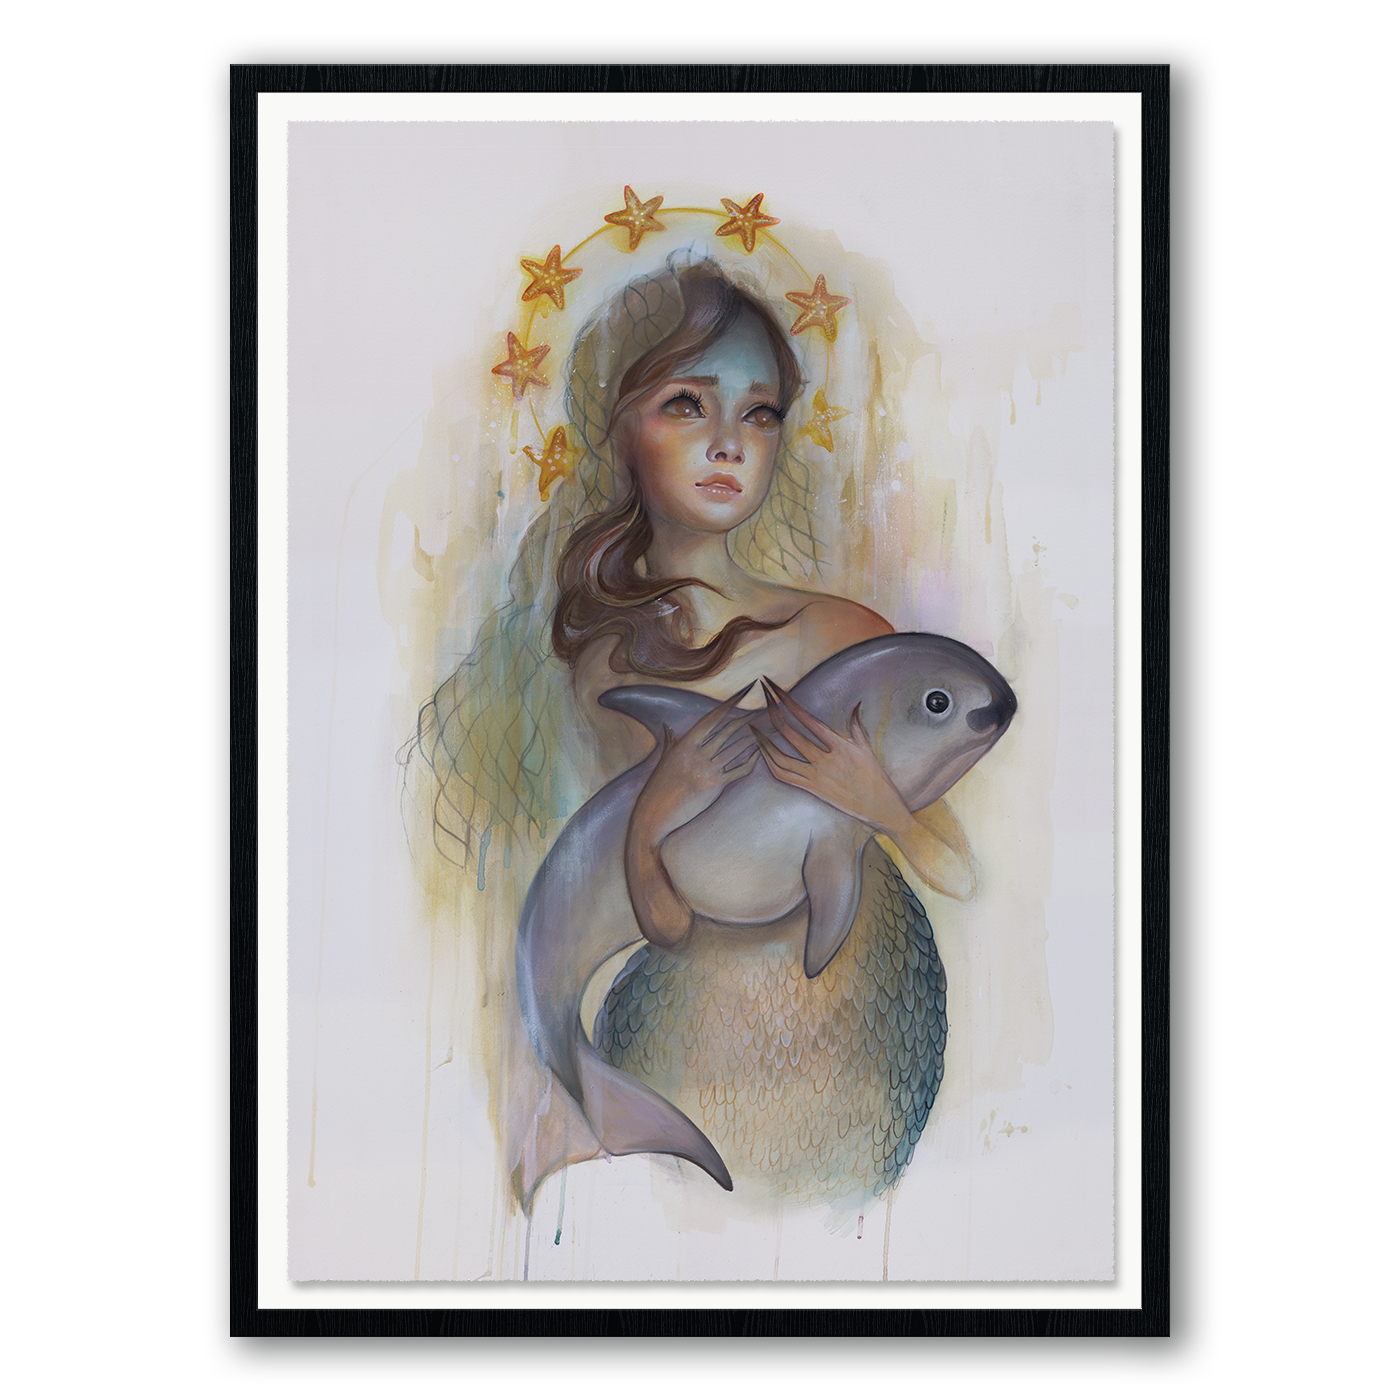 """Sagrada Vaquita"" by Tatiana Suarez.  18"" x 24"" Giclee.  Ed of 50 S/N.  $75"